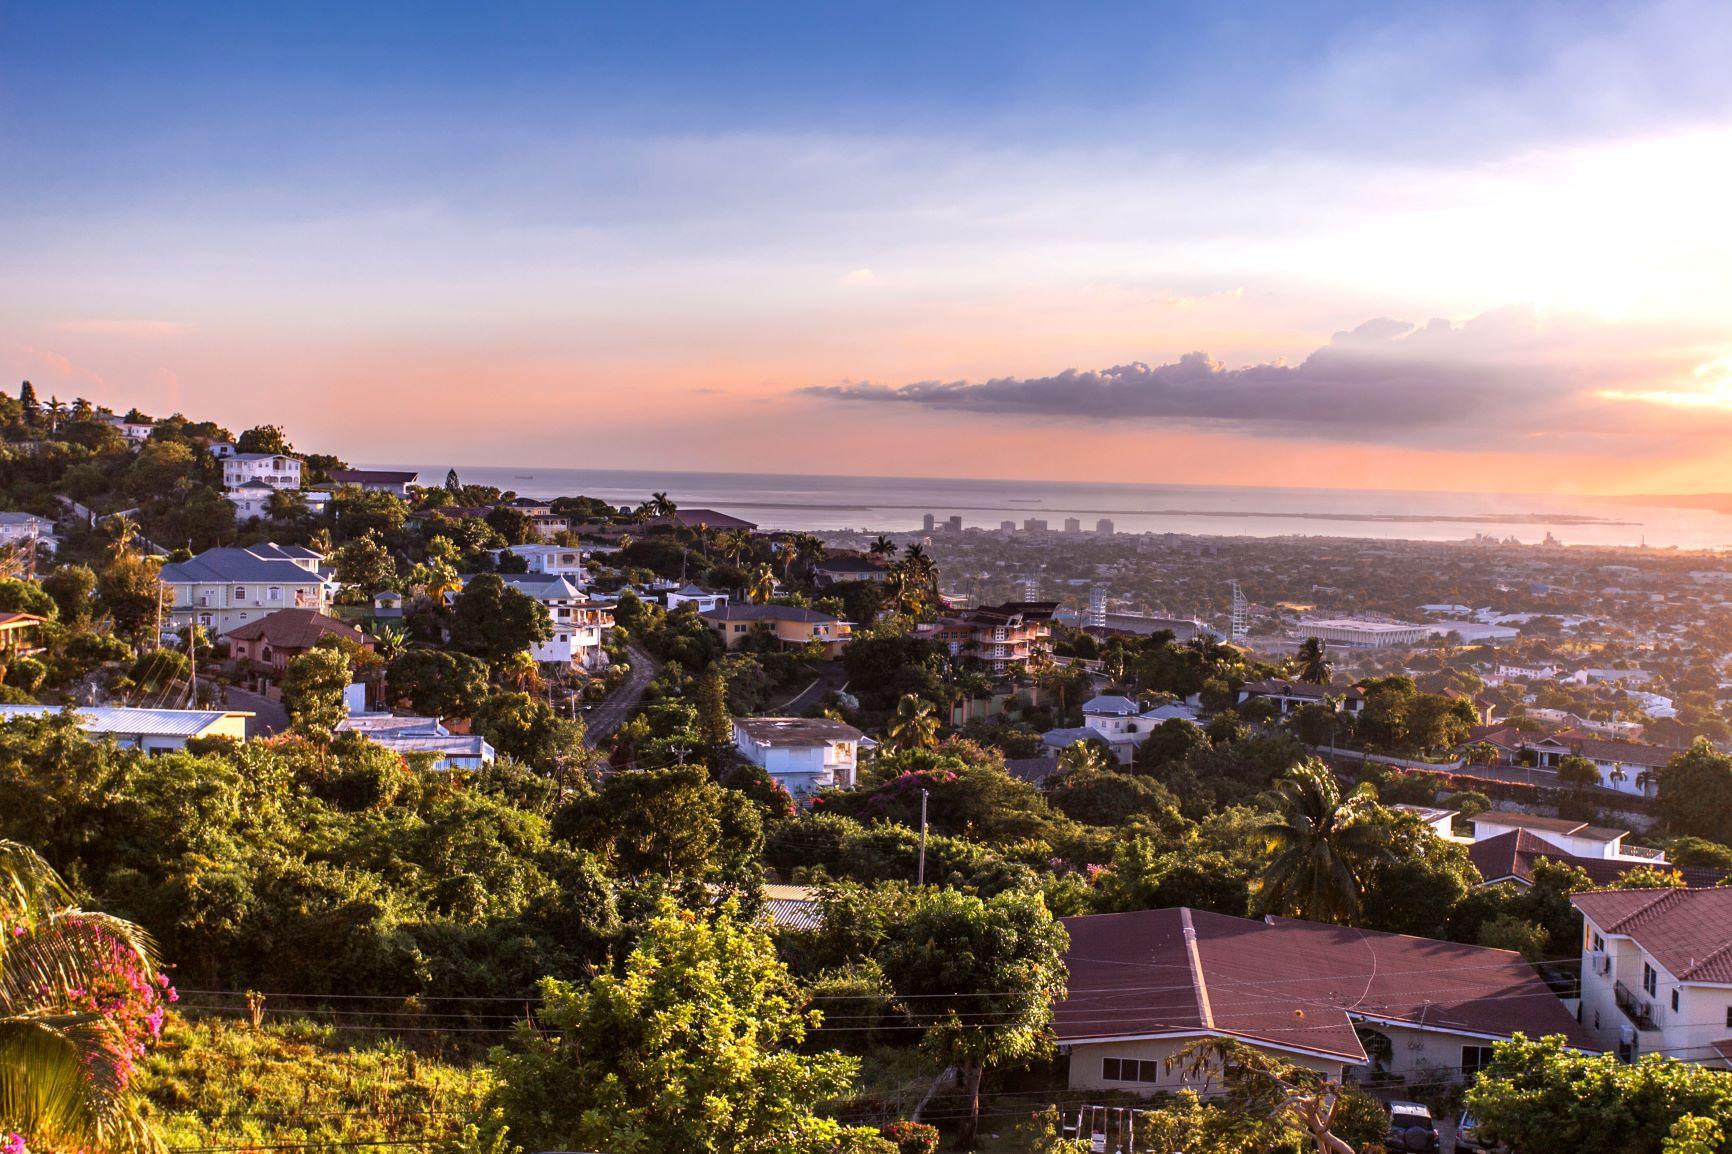 Photo of Kingston, Jamaica